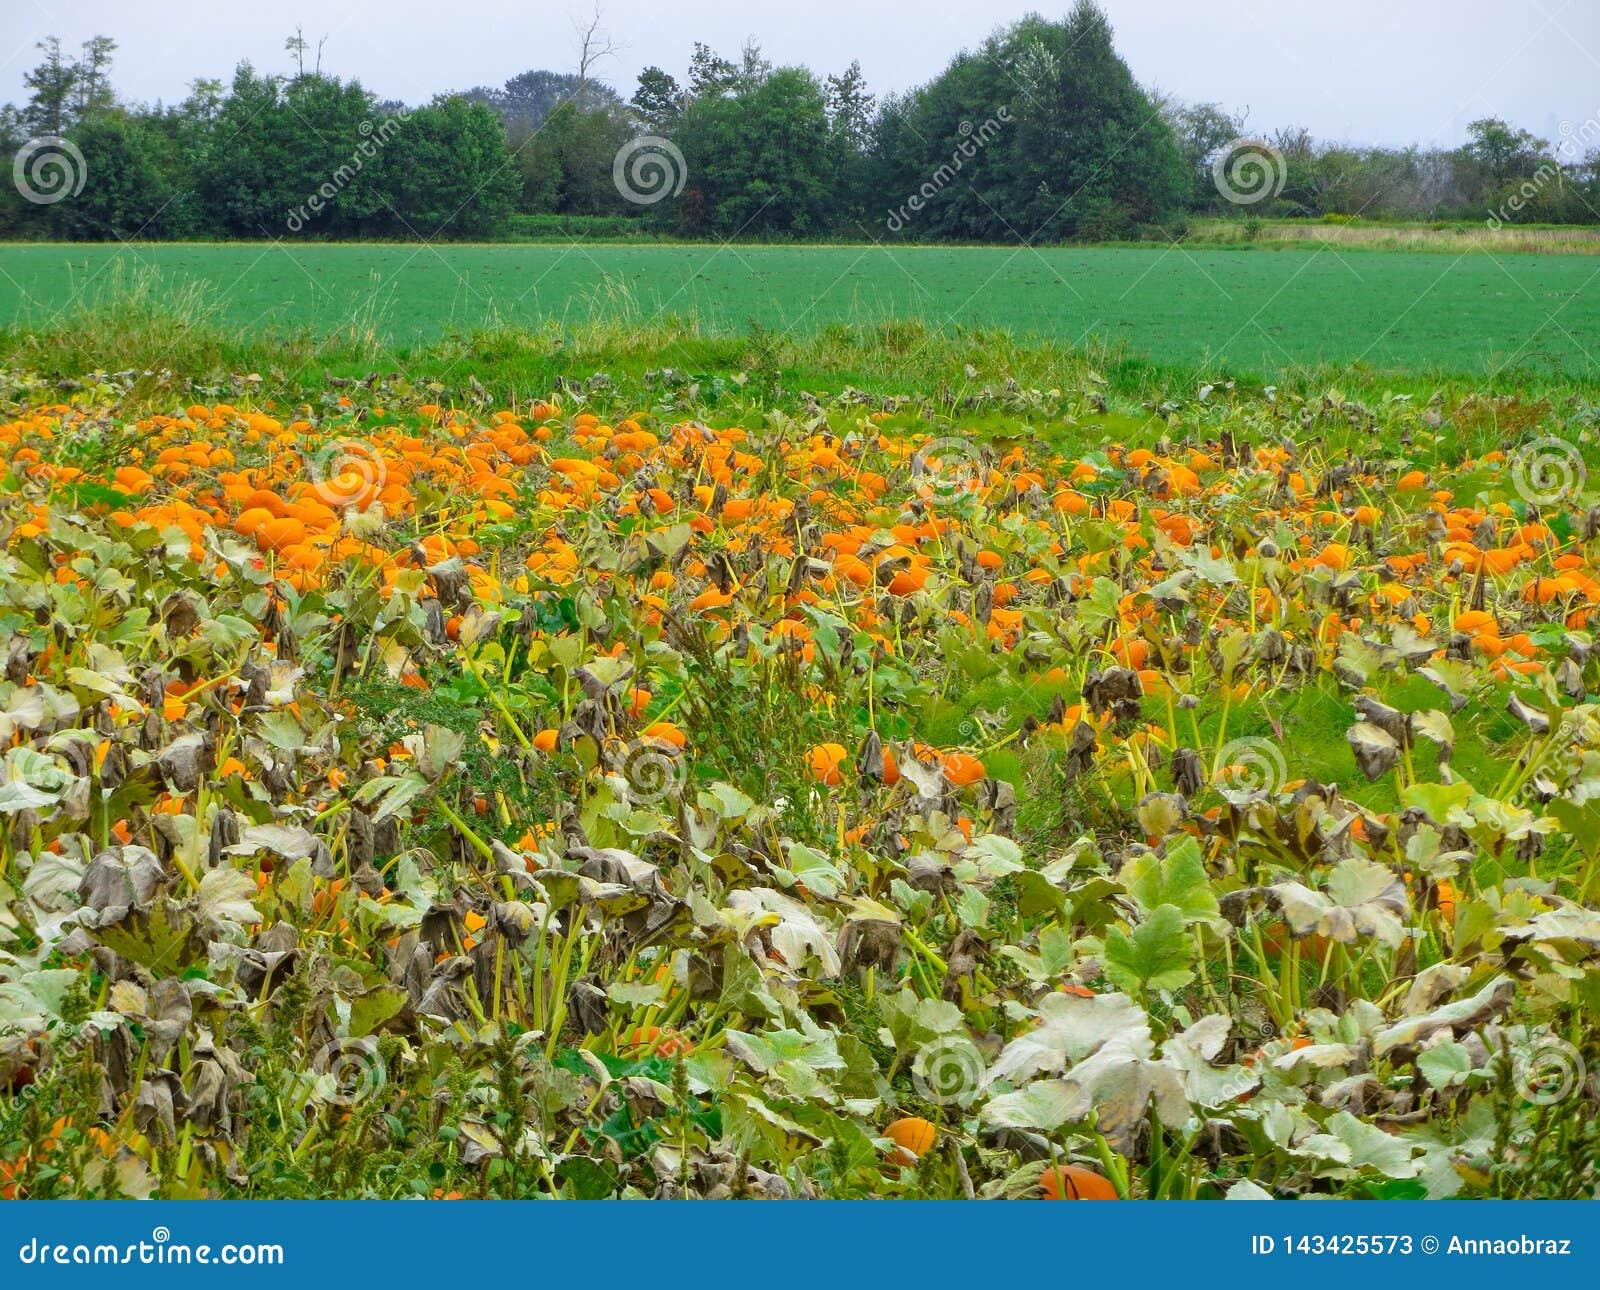 Meny bright pumpkin growing in a farmer`s garden. Nature